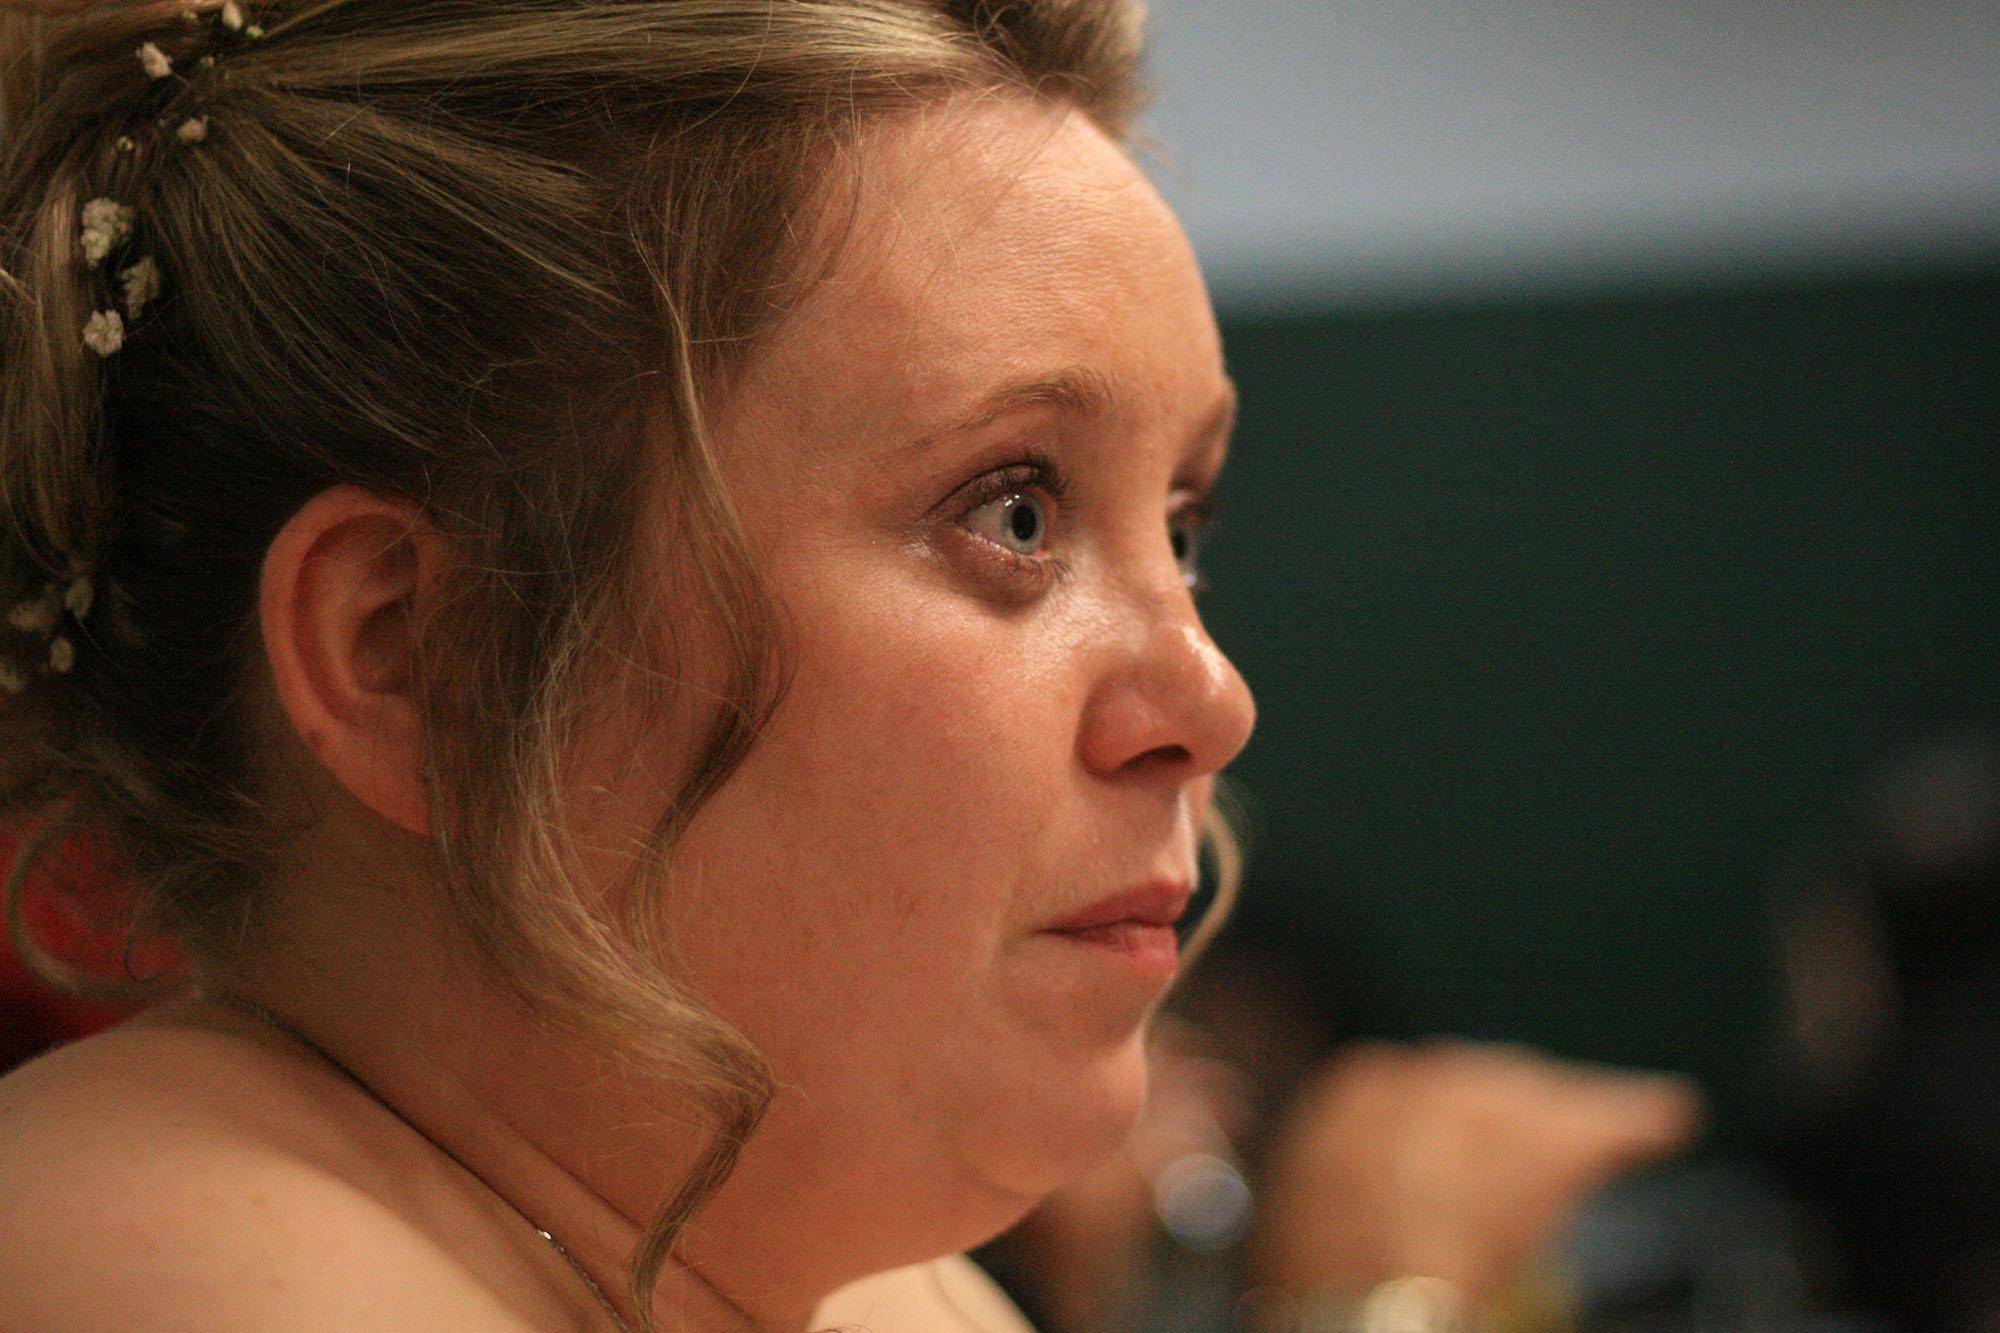 Emilie - 2012-11-03 - 23.24.40